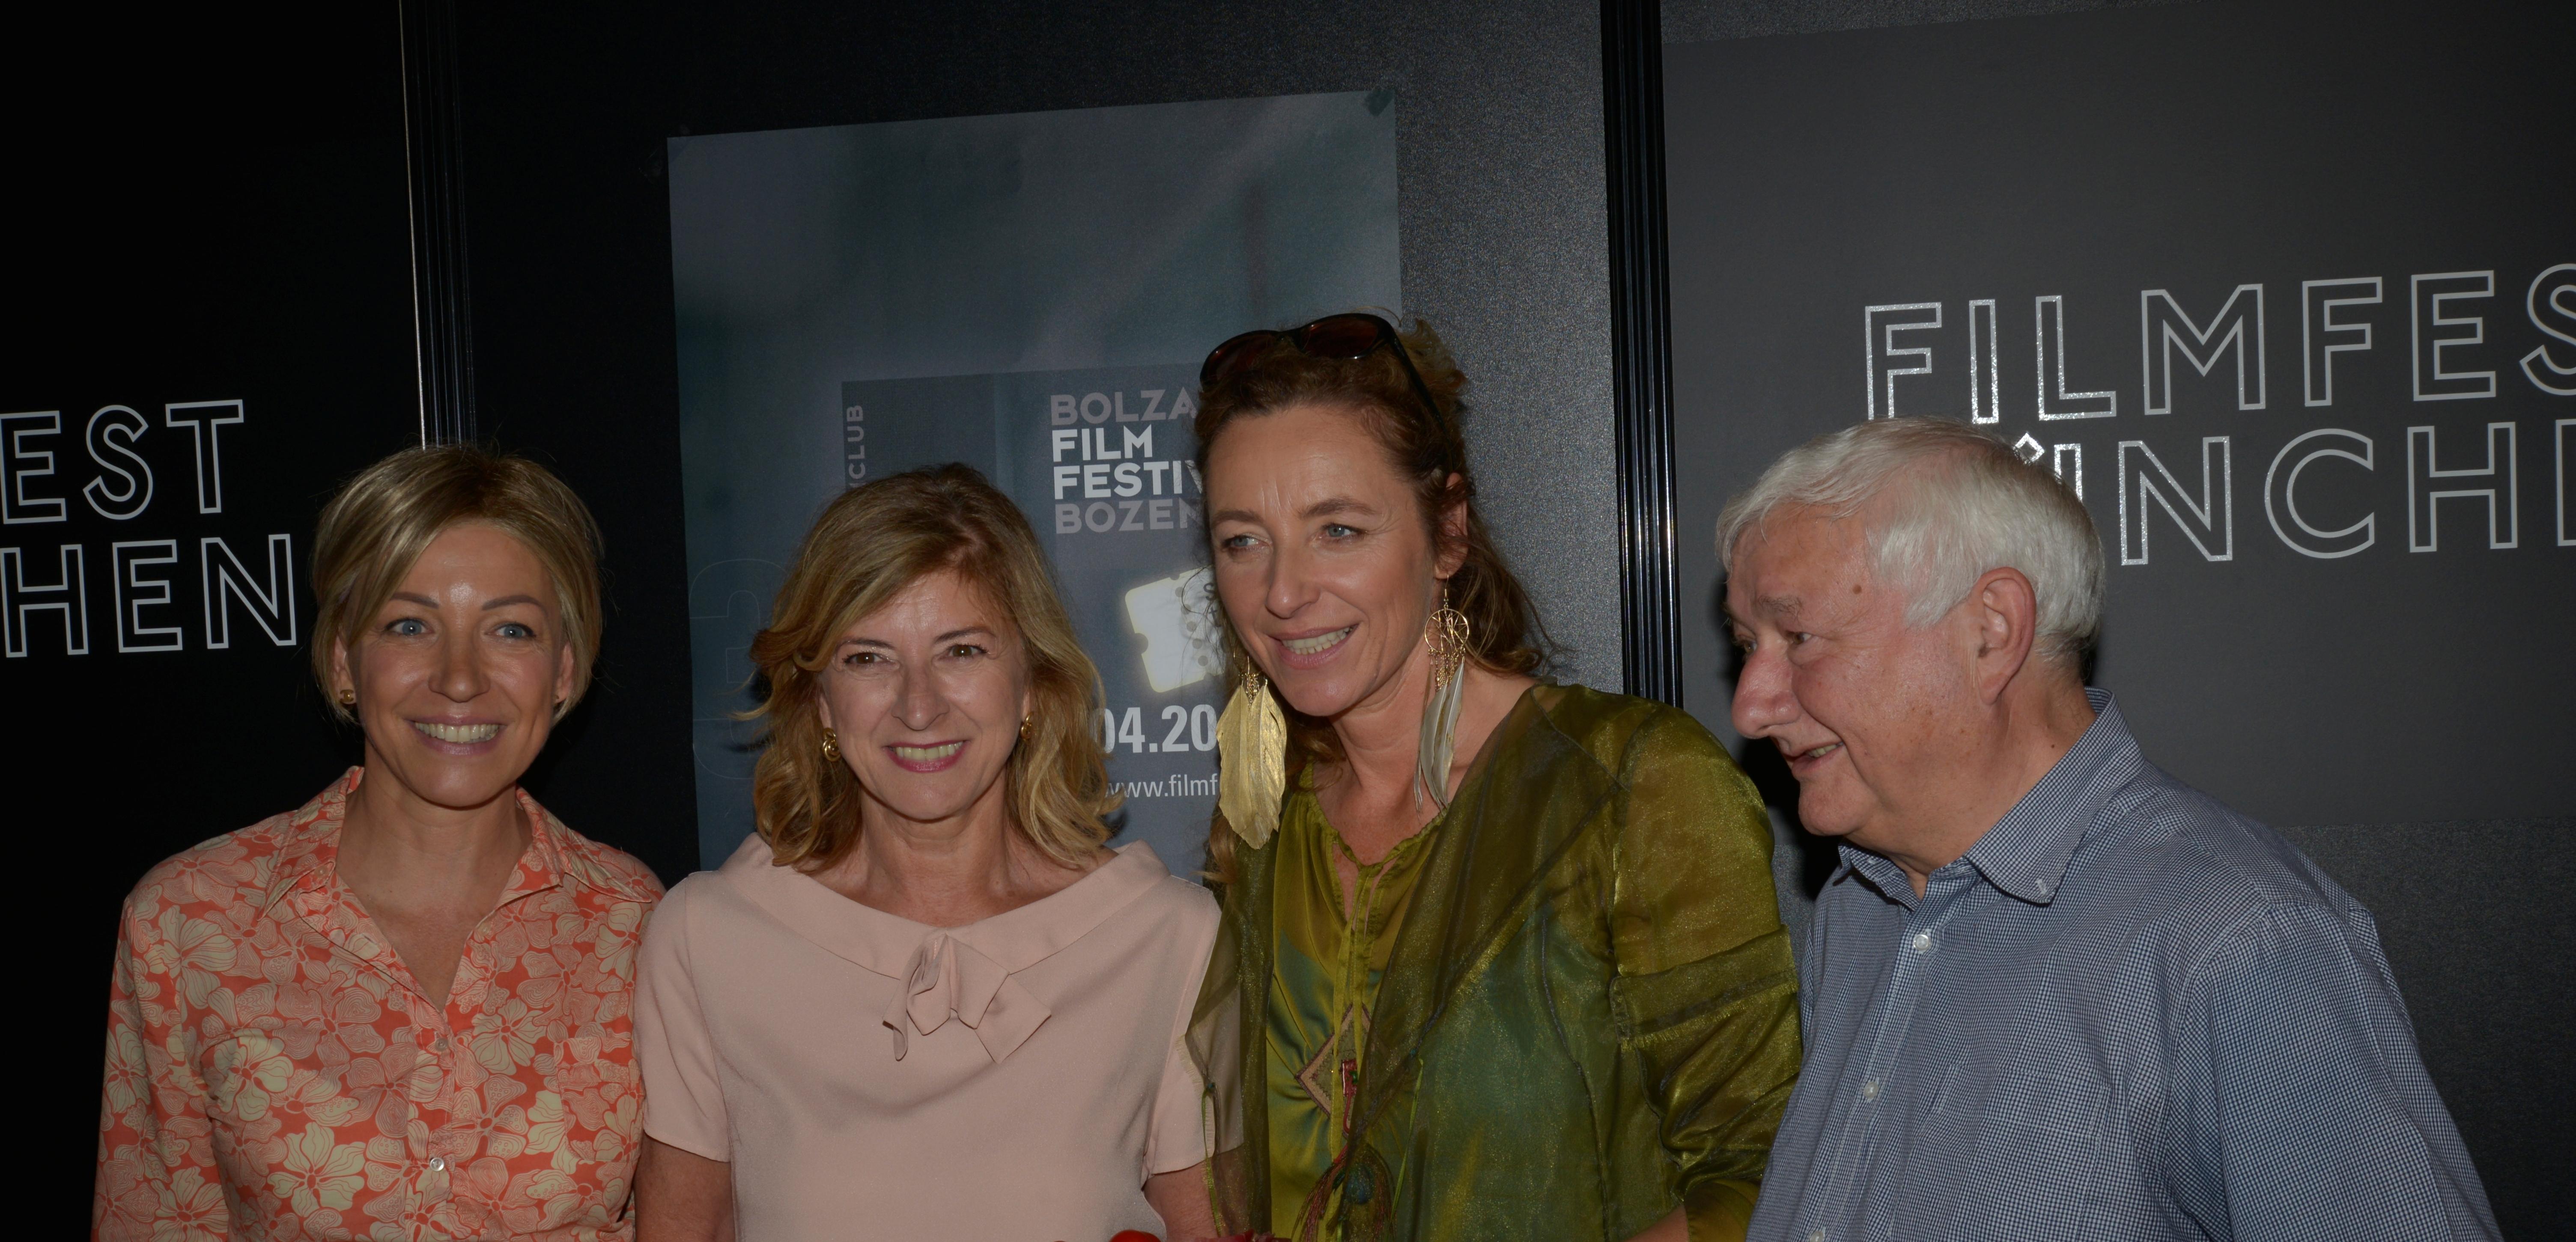 v.l. Antonella Arseni, Helene Christanell, Diana Iljine, Martin kaufmann.Filmfestival München2 127